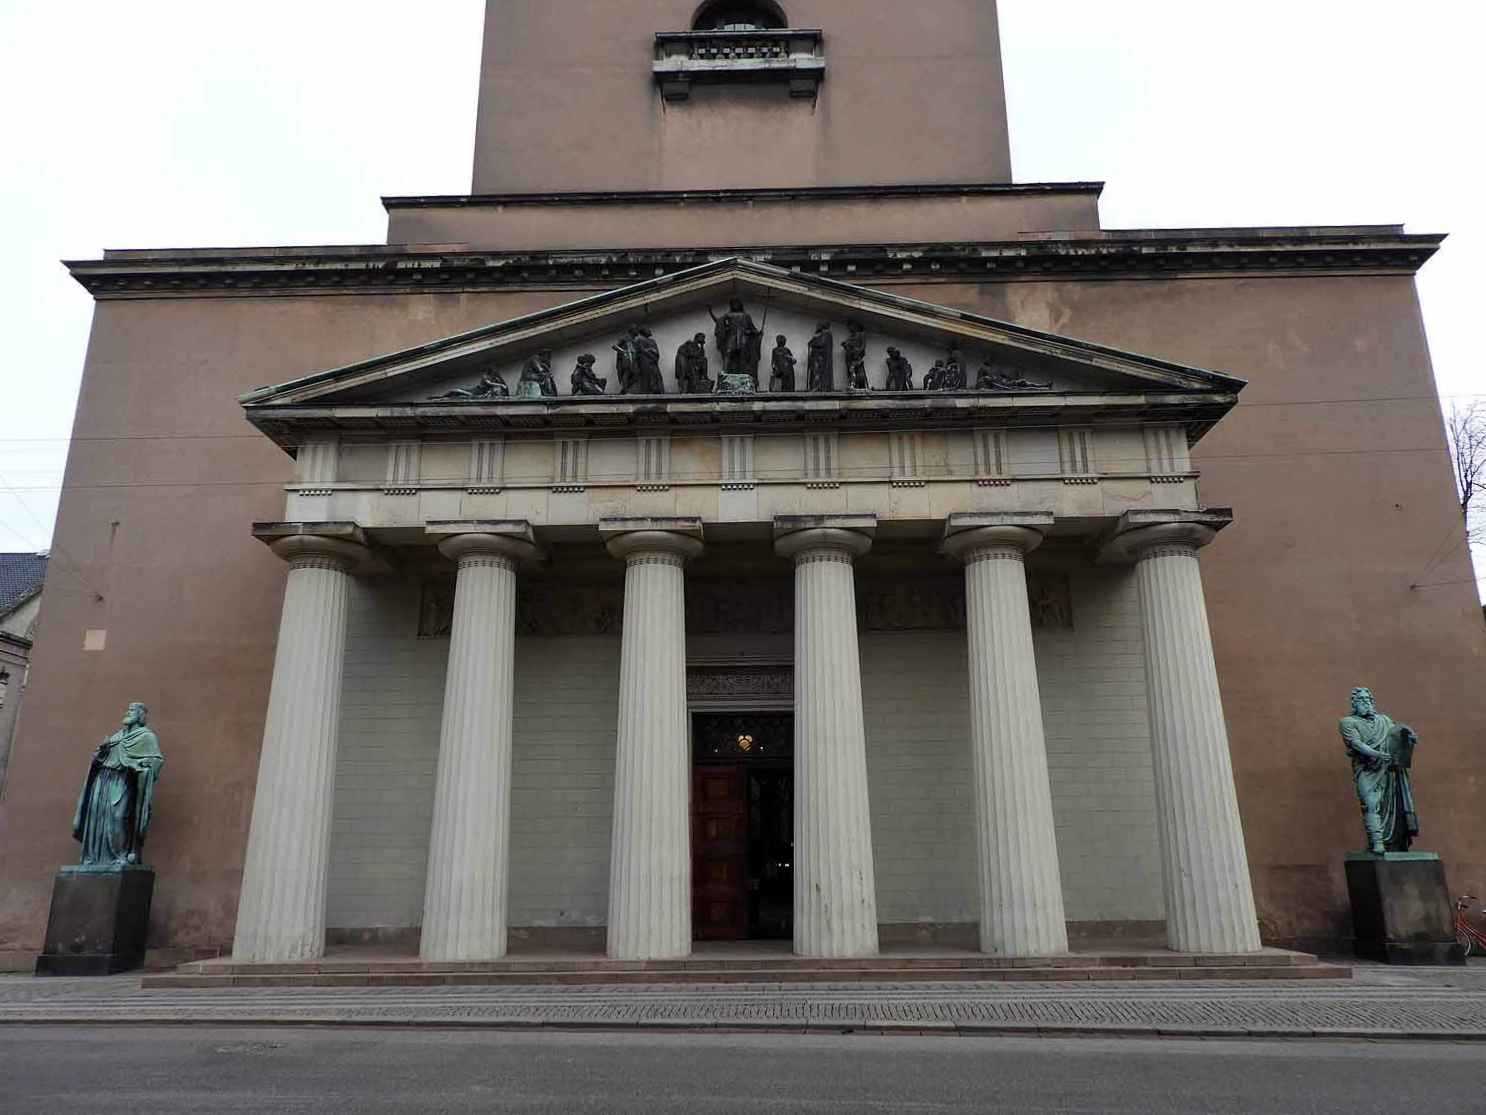 denmark-copenhagen-vor-frue-kirke-cathederal-exterior.JPG